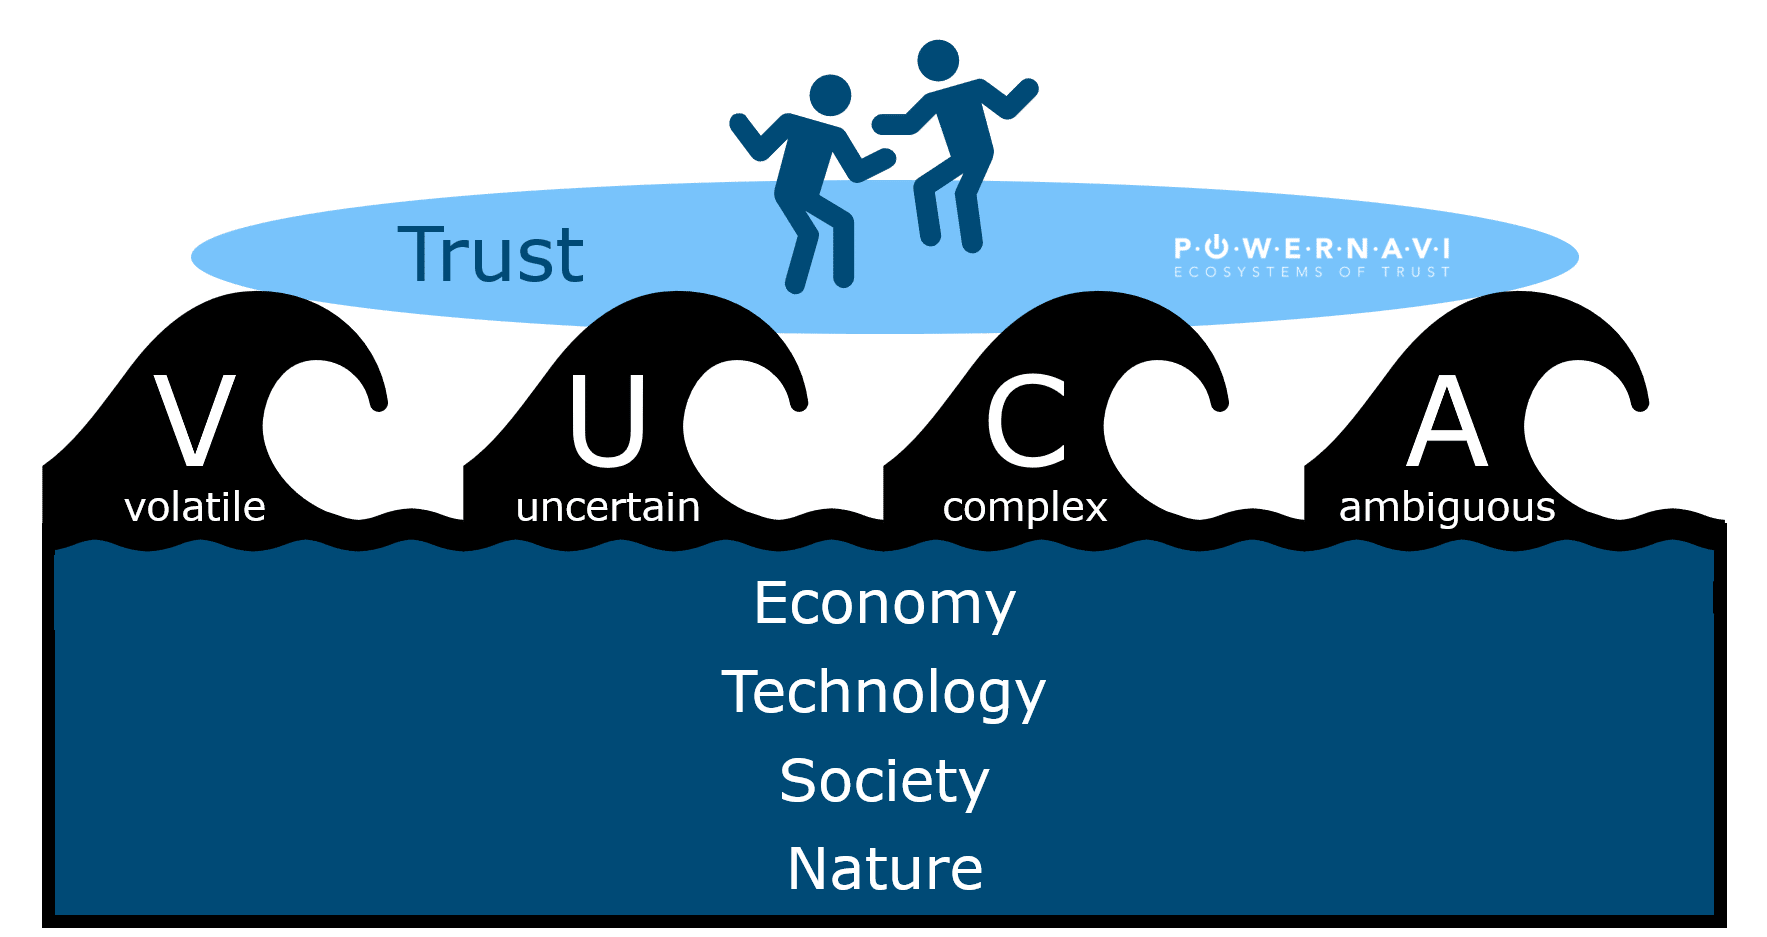 Enjoy riding VUCA Waves @ powernavi ecosystems of trust